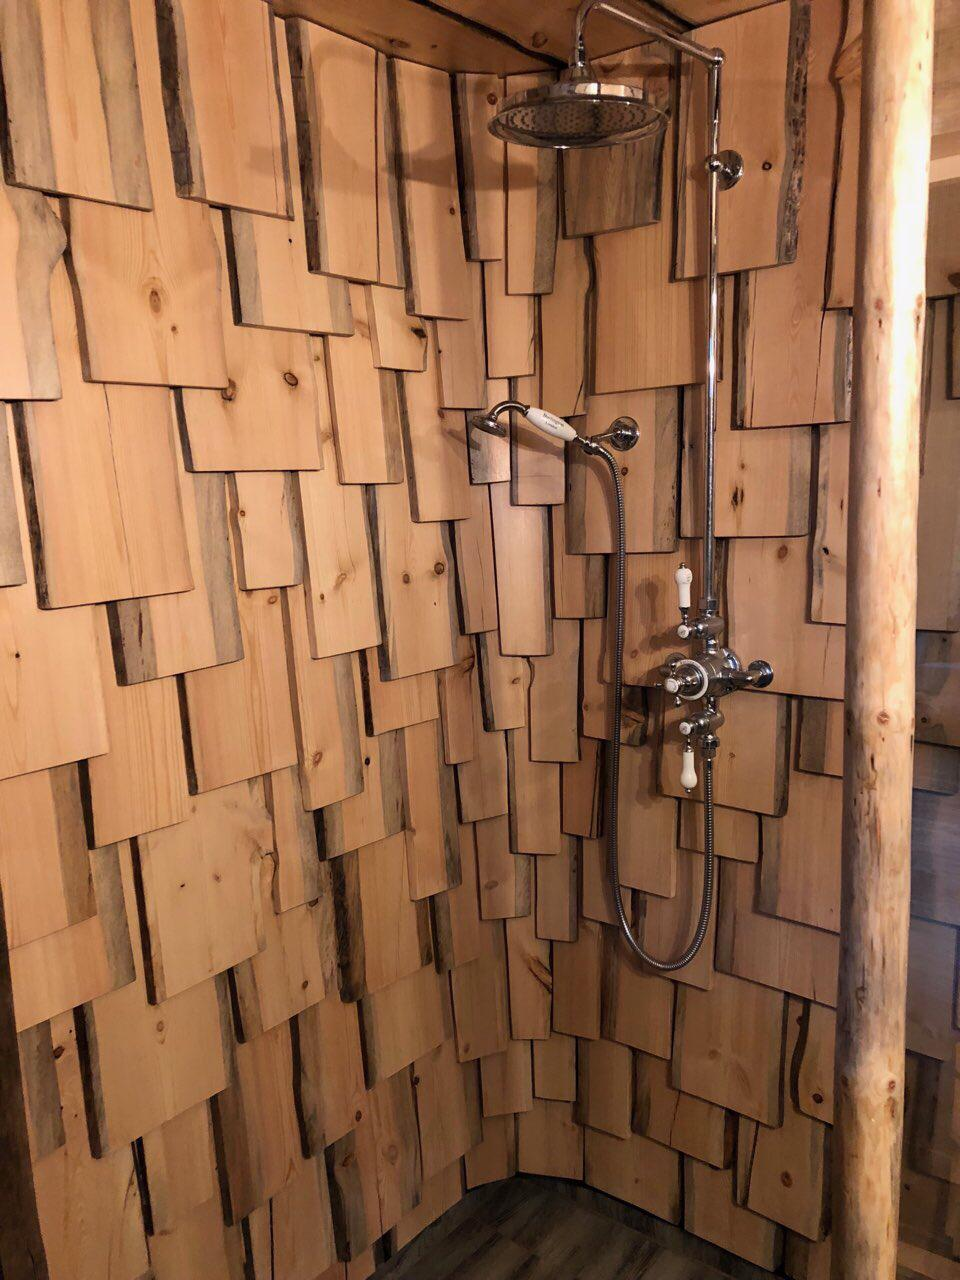 Pine tiles